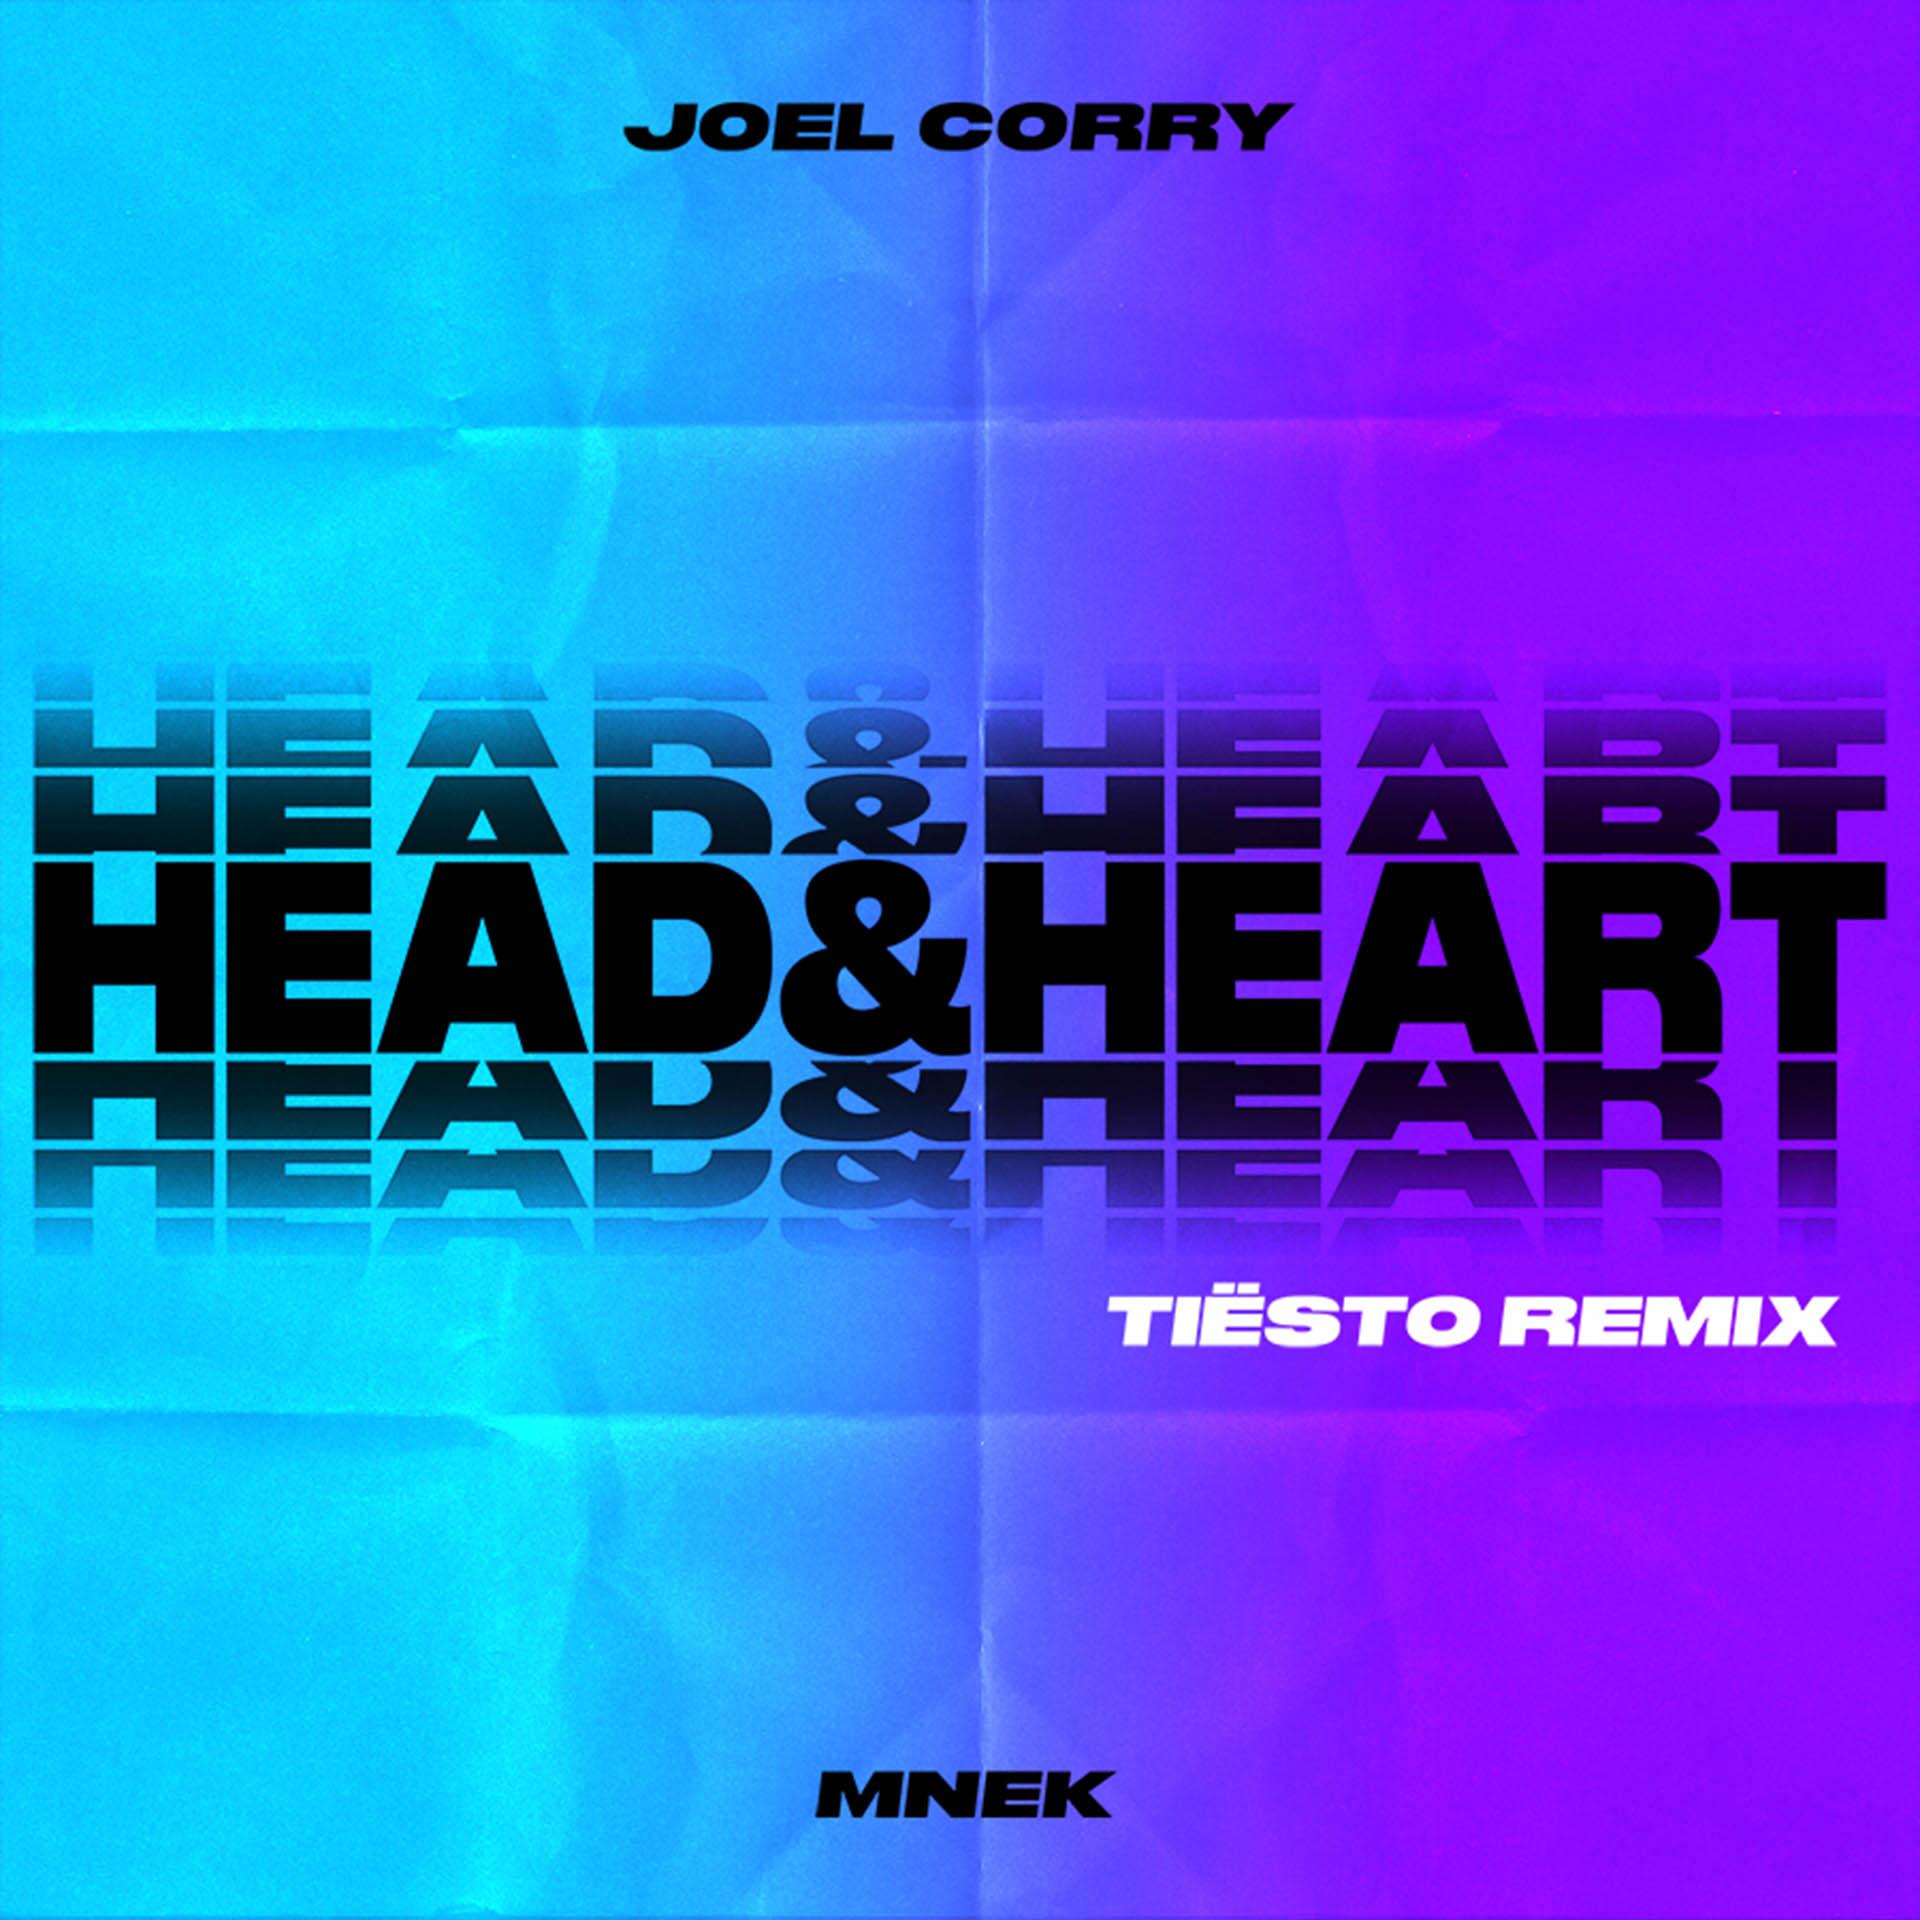 Joel Corry - Head and Heart - Tiesto Remix